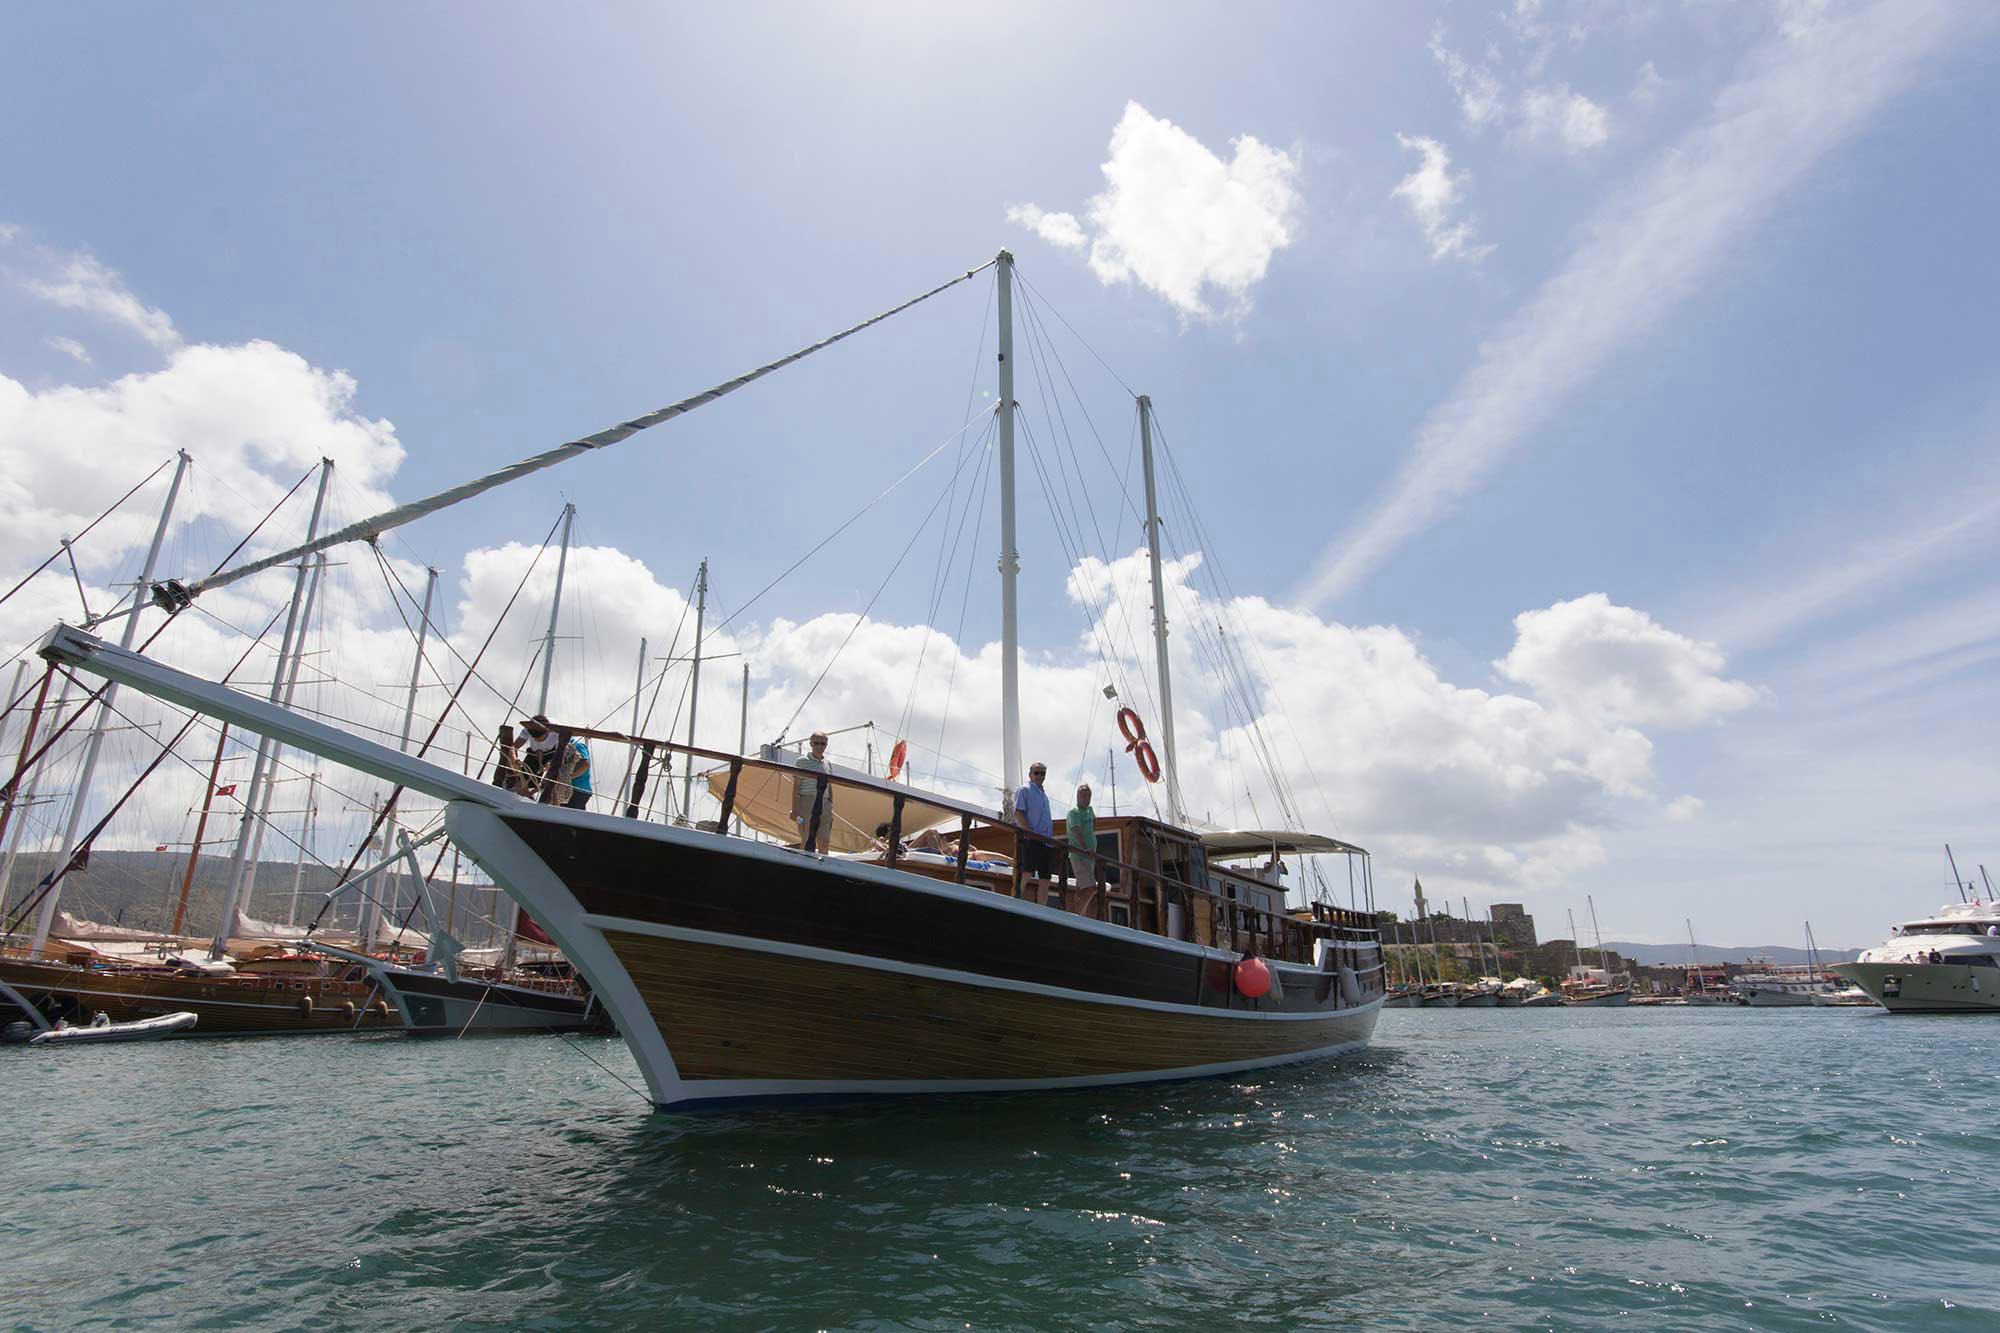 Luxury Traditional Motor Sailer (Gulet) 82 Feet